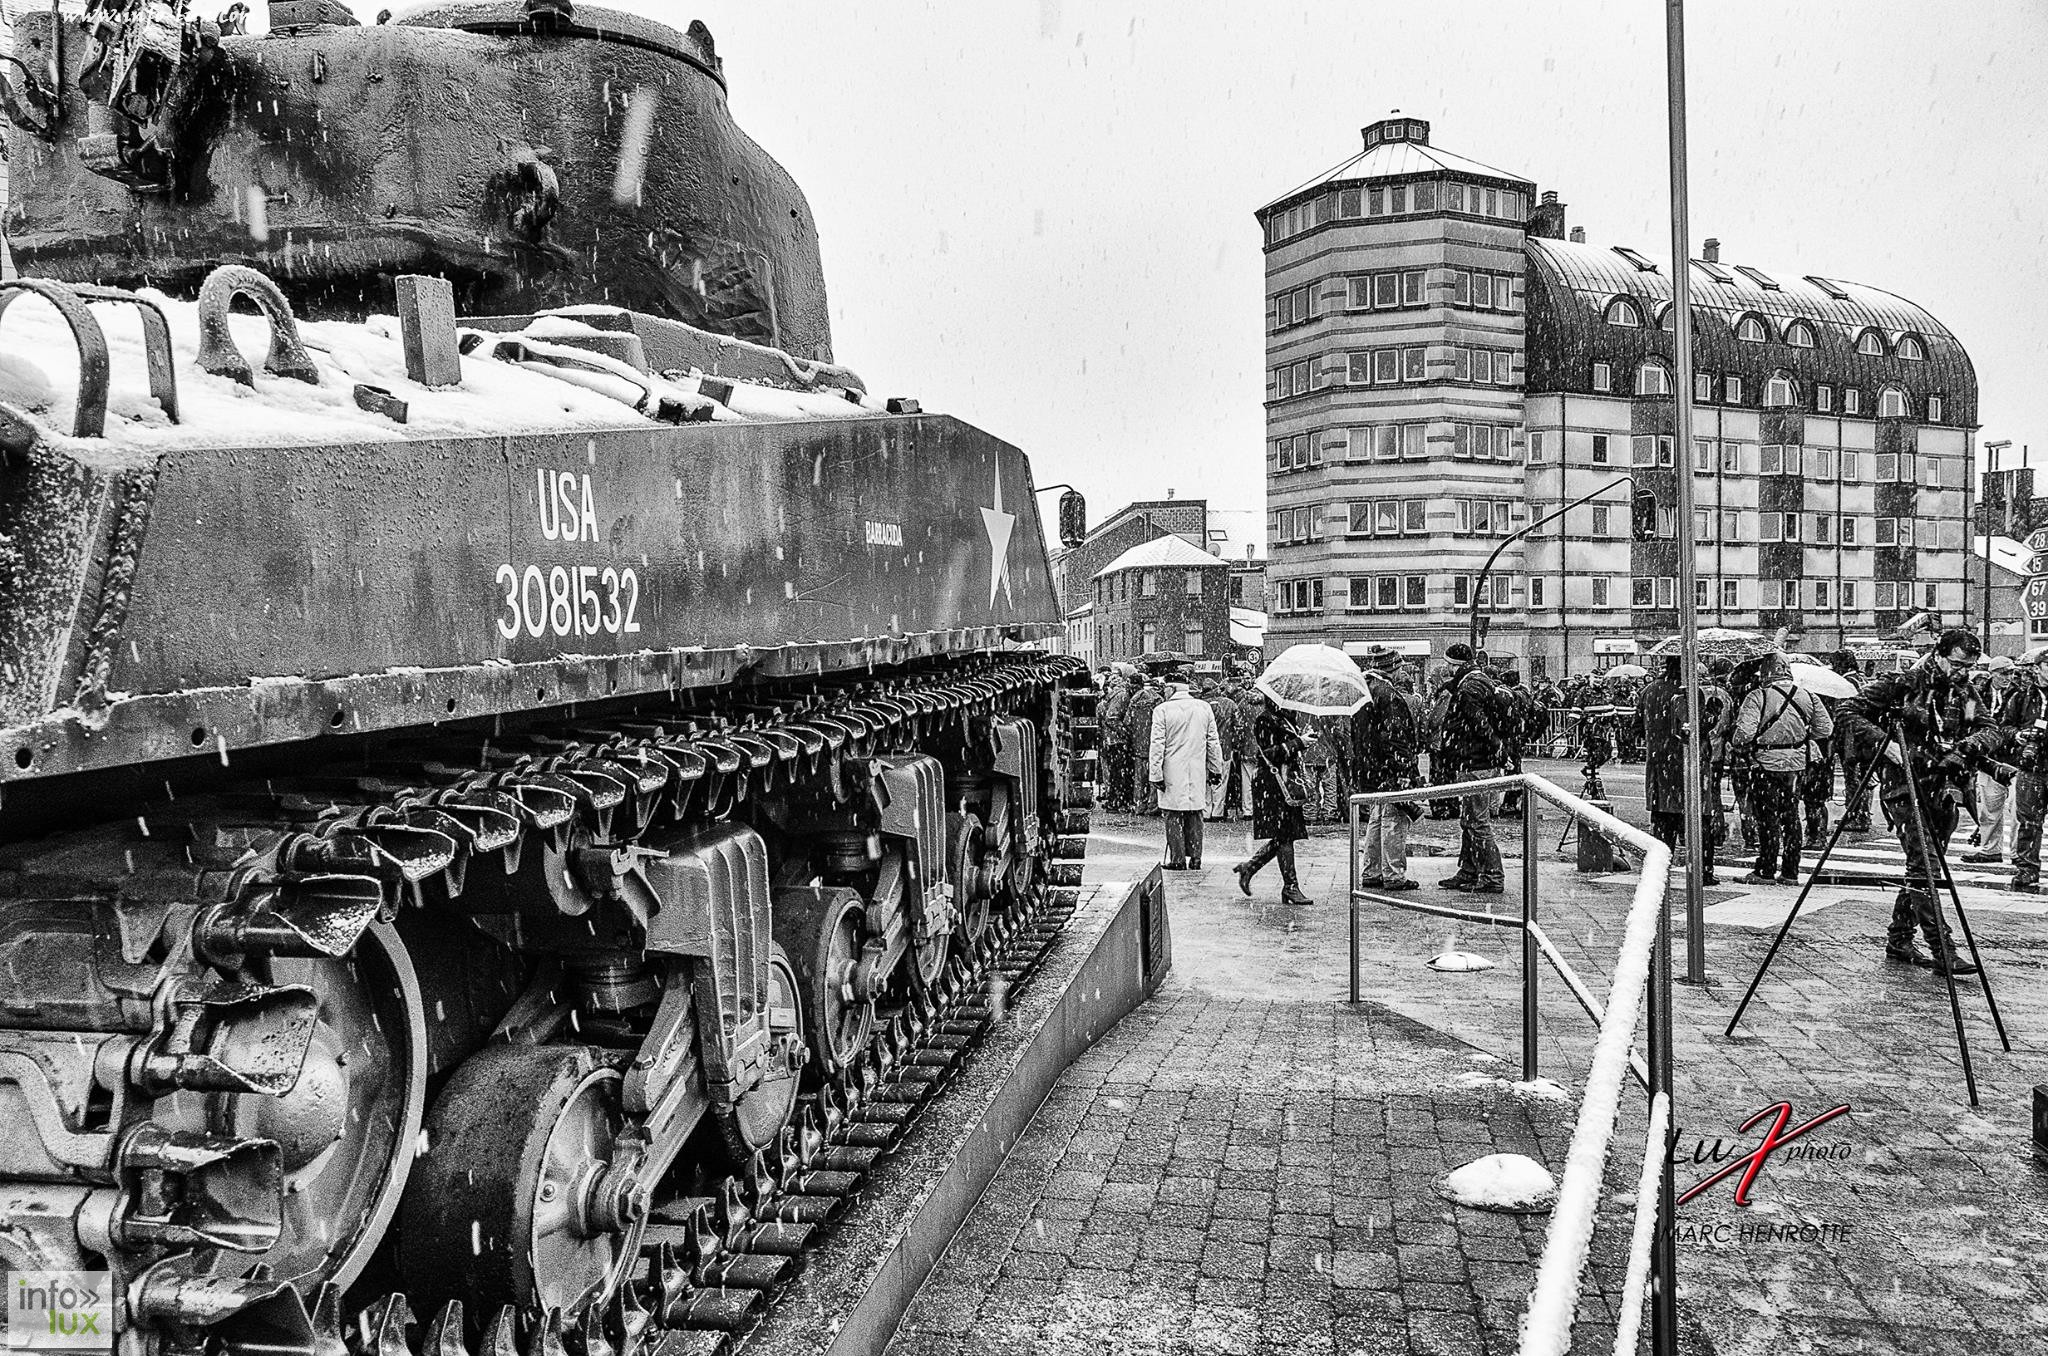 images/stories/PHOTOSREP/Bastogne/70ansMarc1/infoluxBAS014